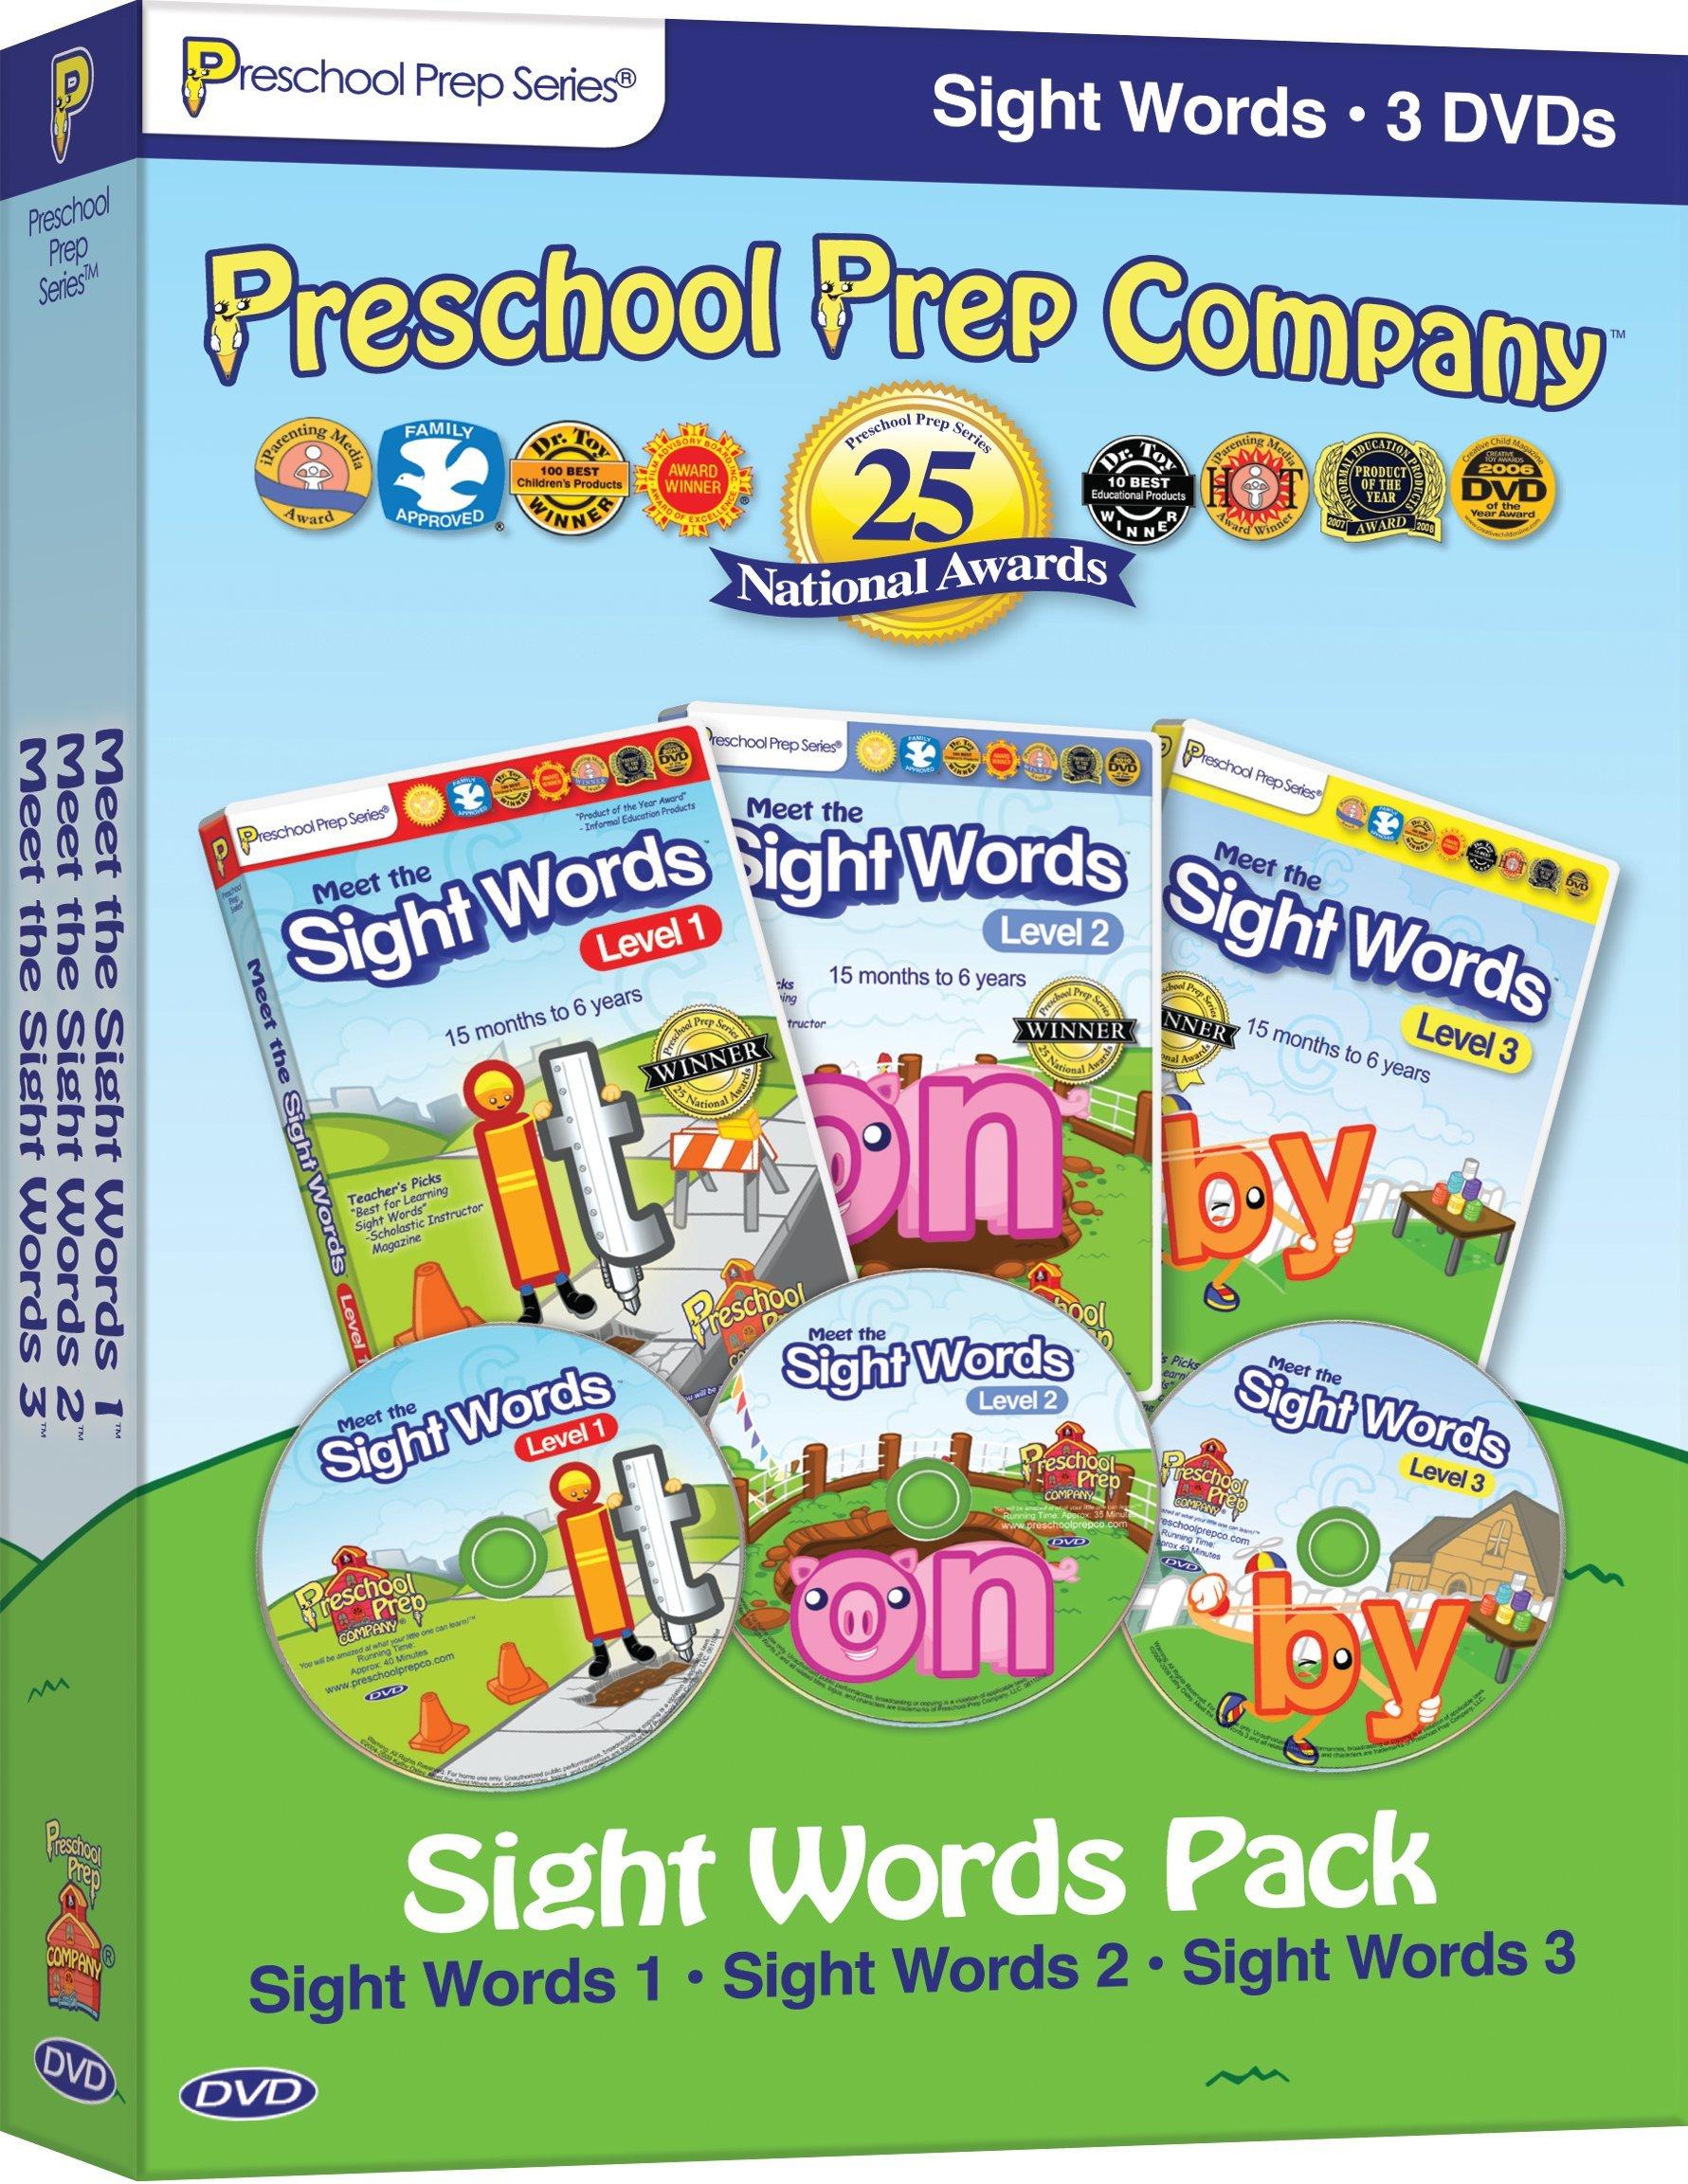 Amazoncom Preschool Prep Series Sight Words Pack Meet The Sight